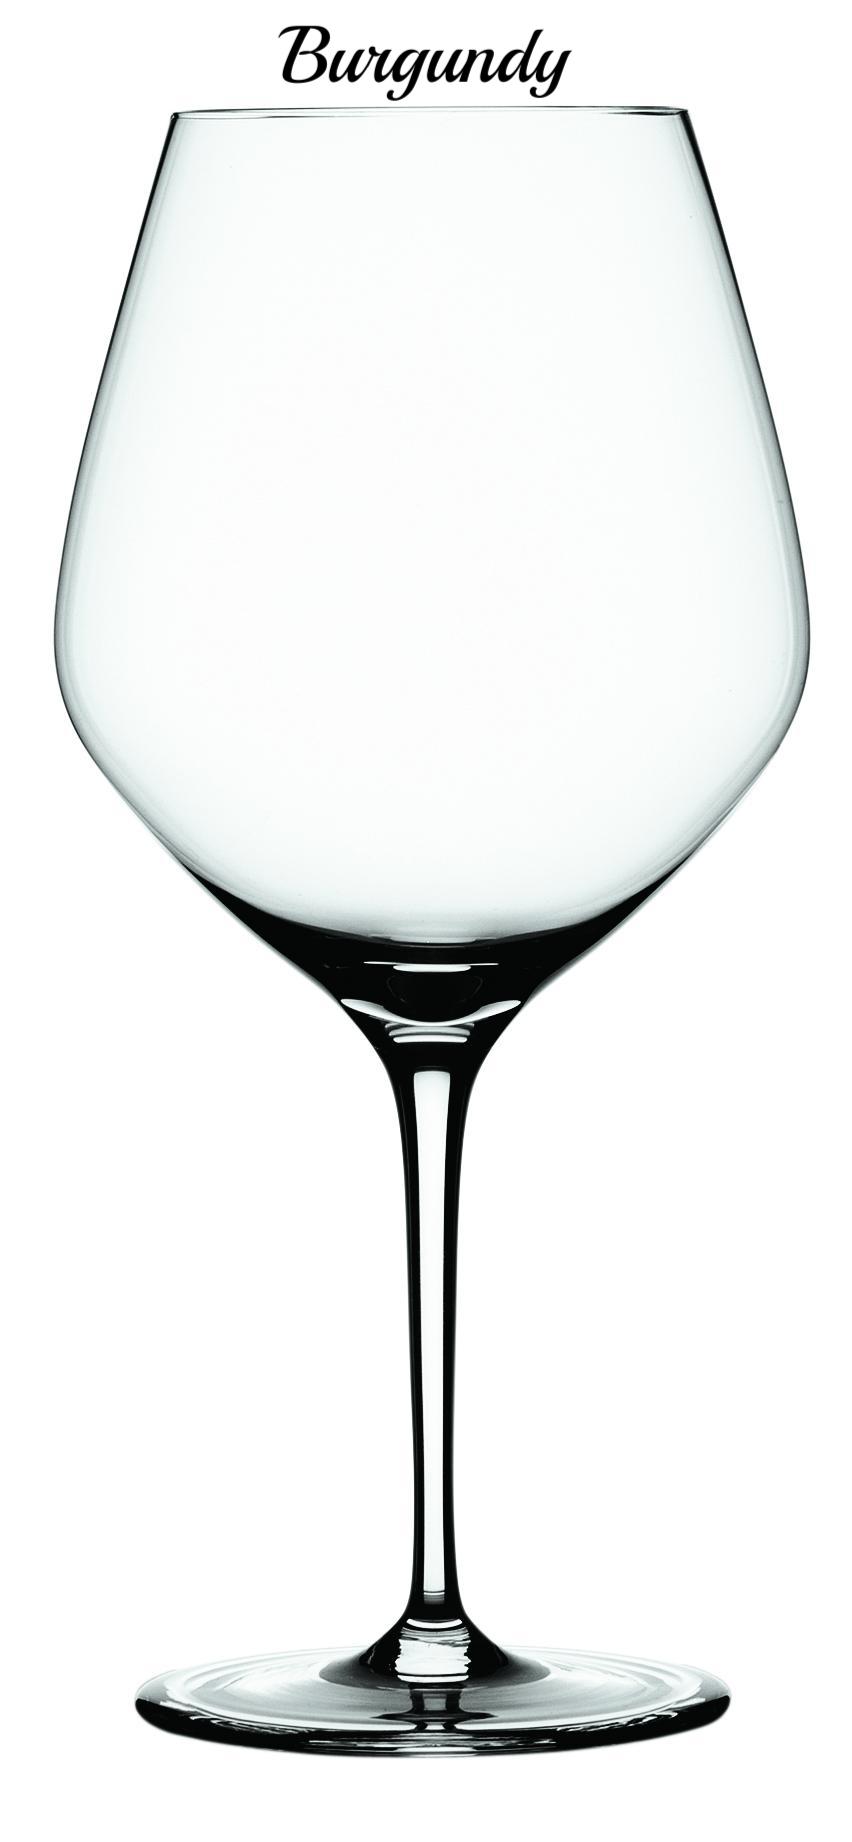 Authentis Burgundy 4408000.jpg